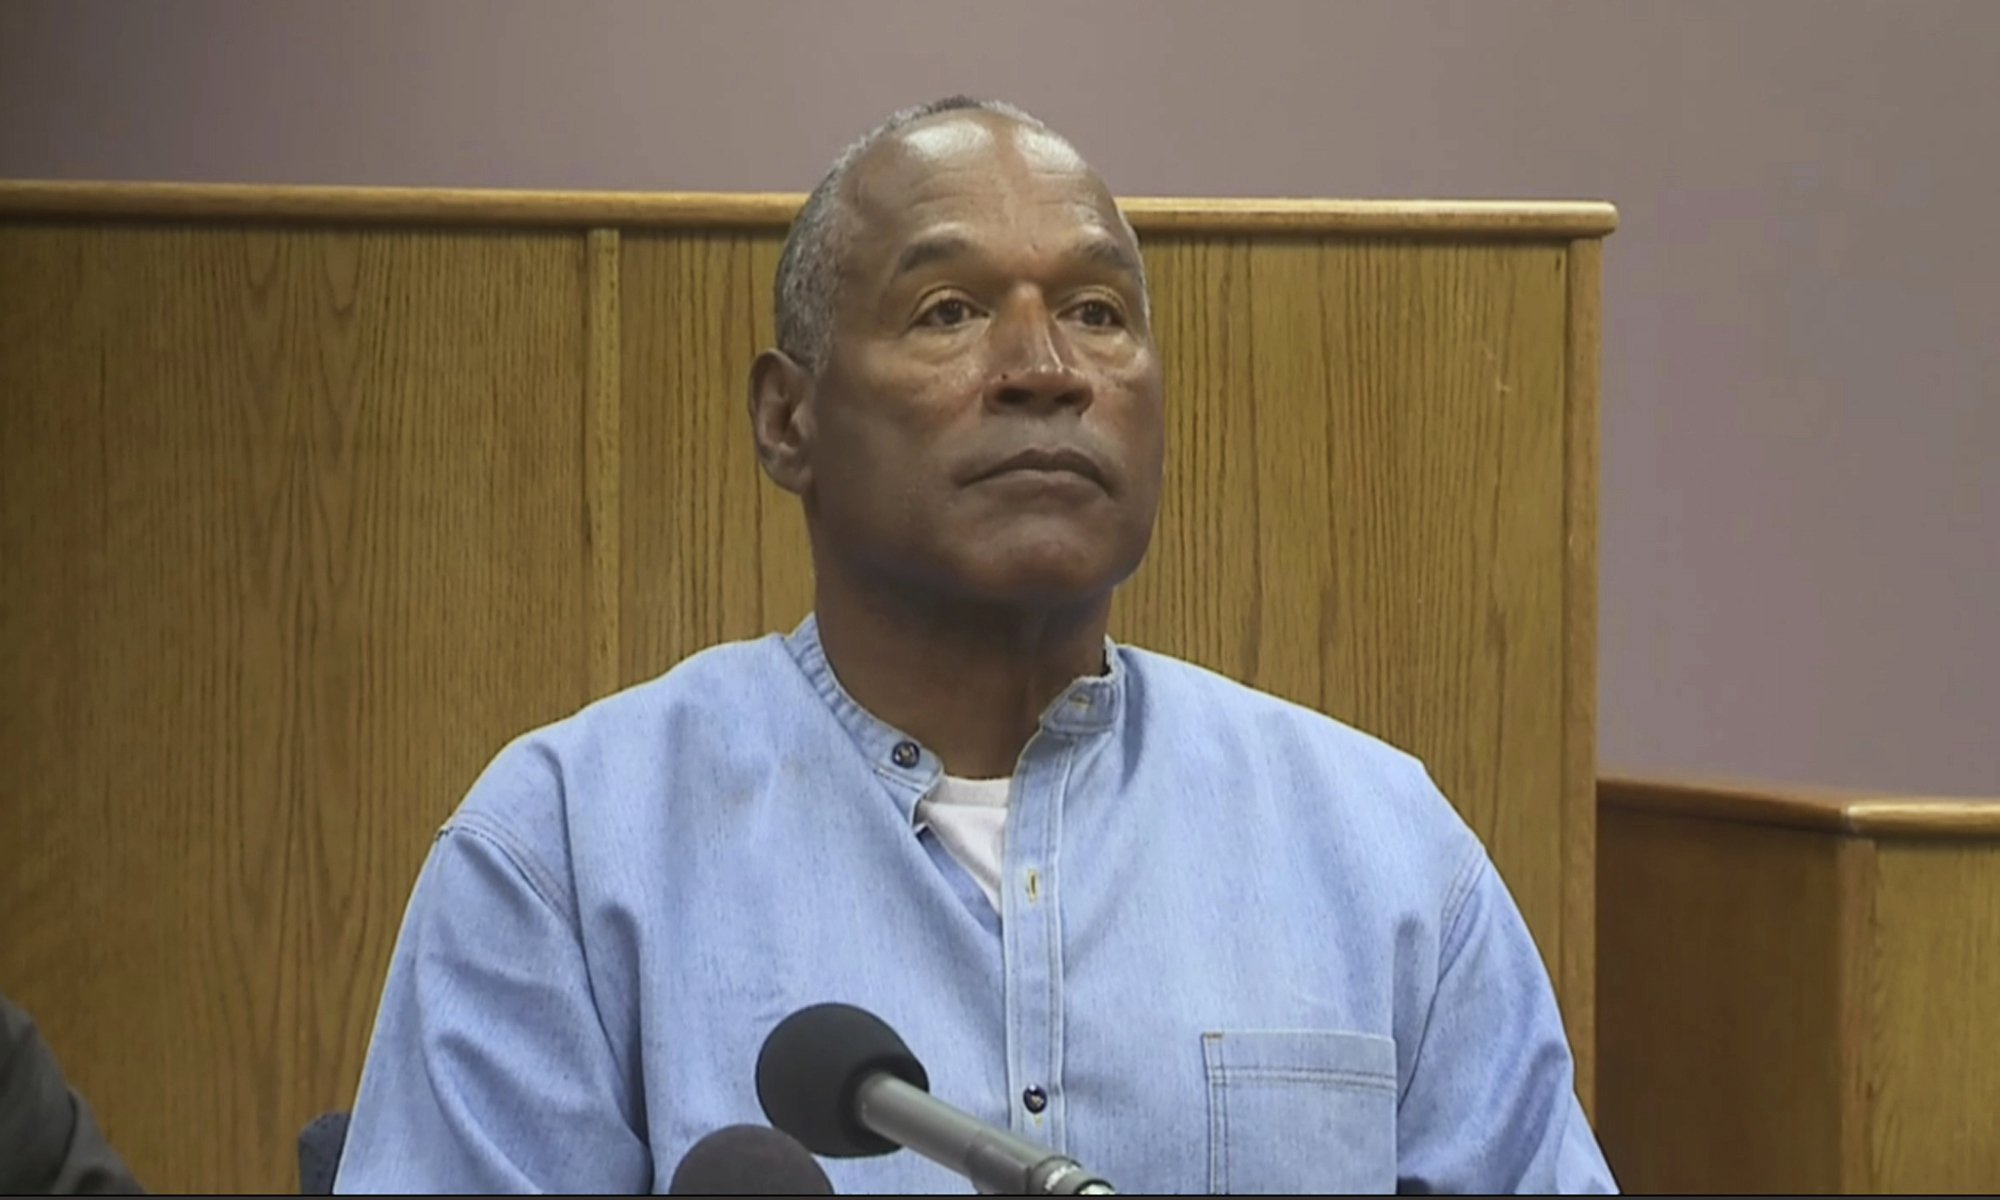 O.J. Simpson asks parole board to set him free